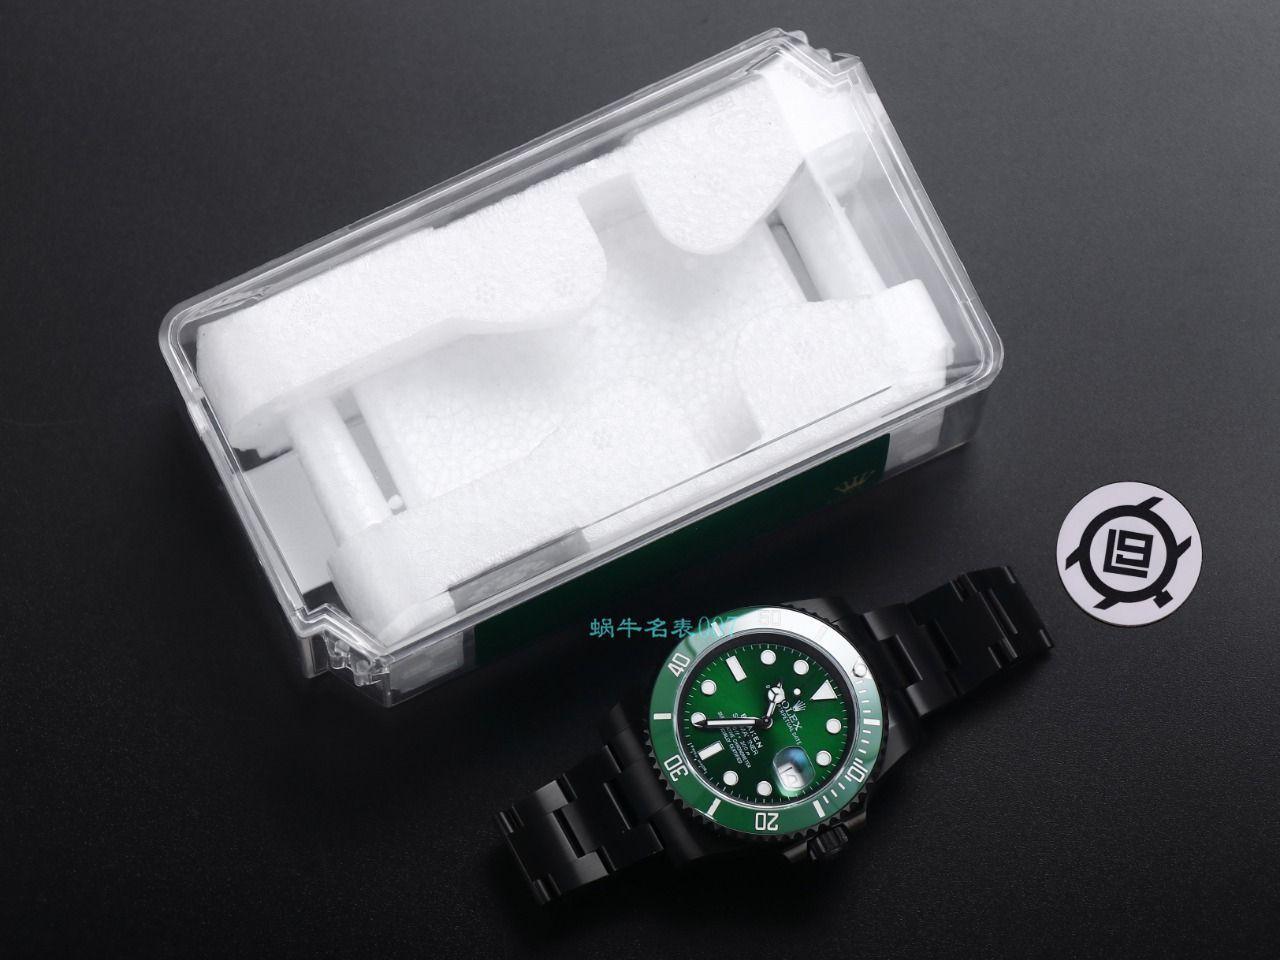 V9厂劳力士水鬼顶级复刻手表BLAKEN  SUBMARINER  DATE LV官方同款曜黑改装版 / R670